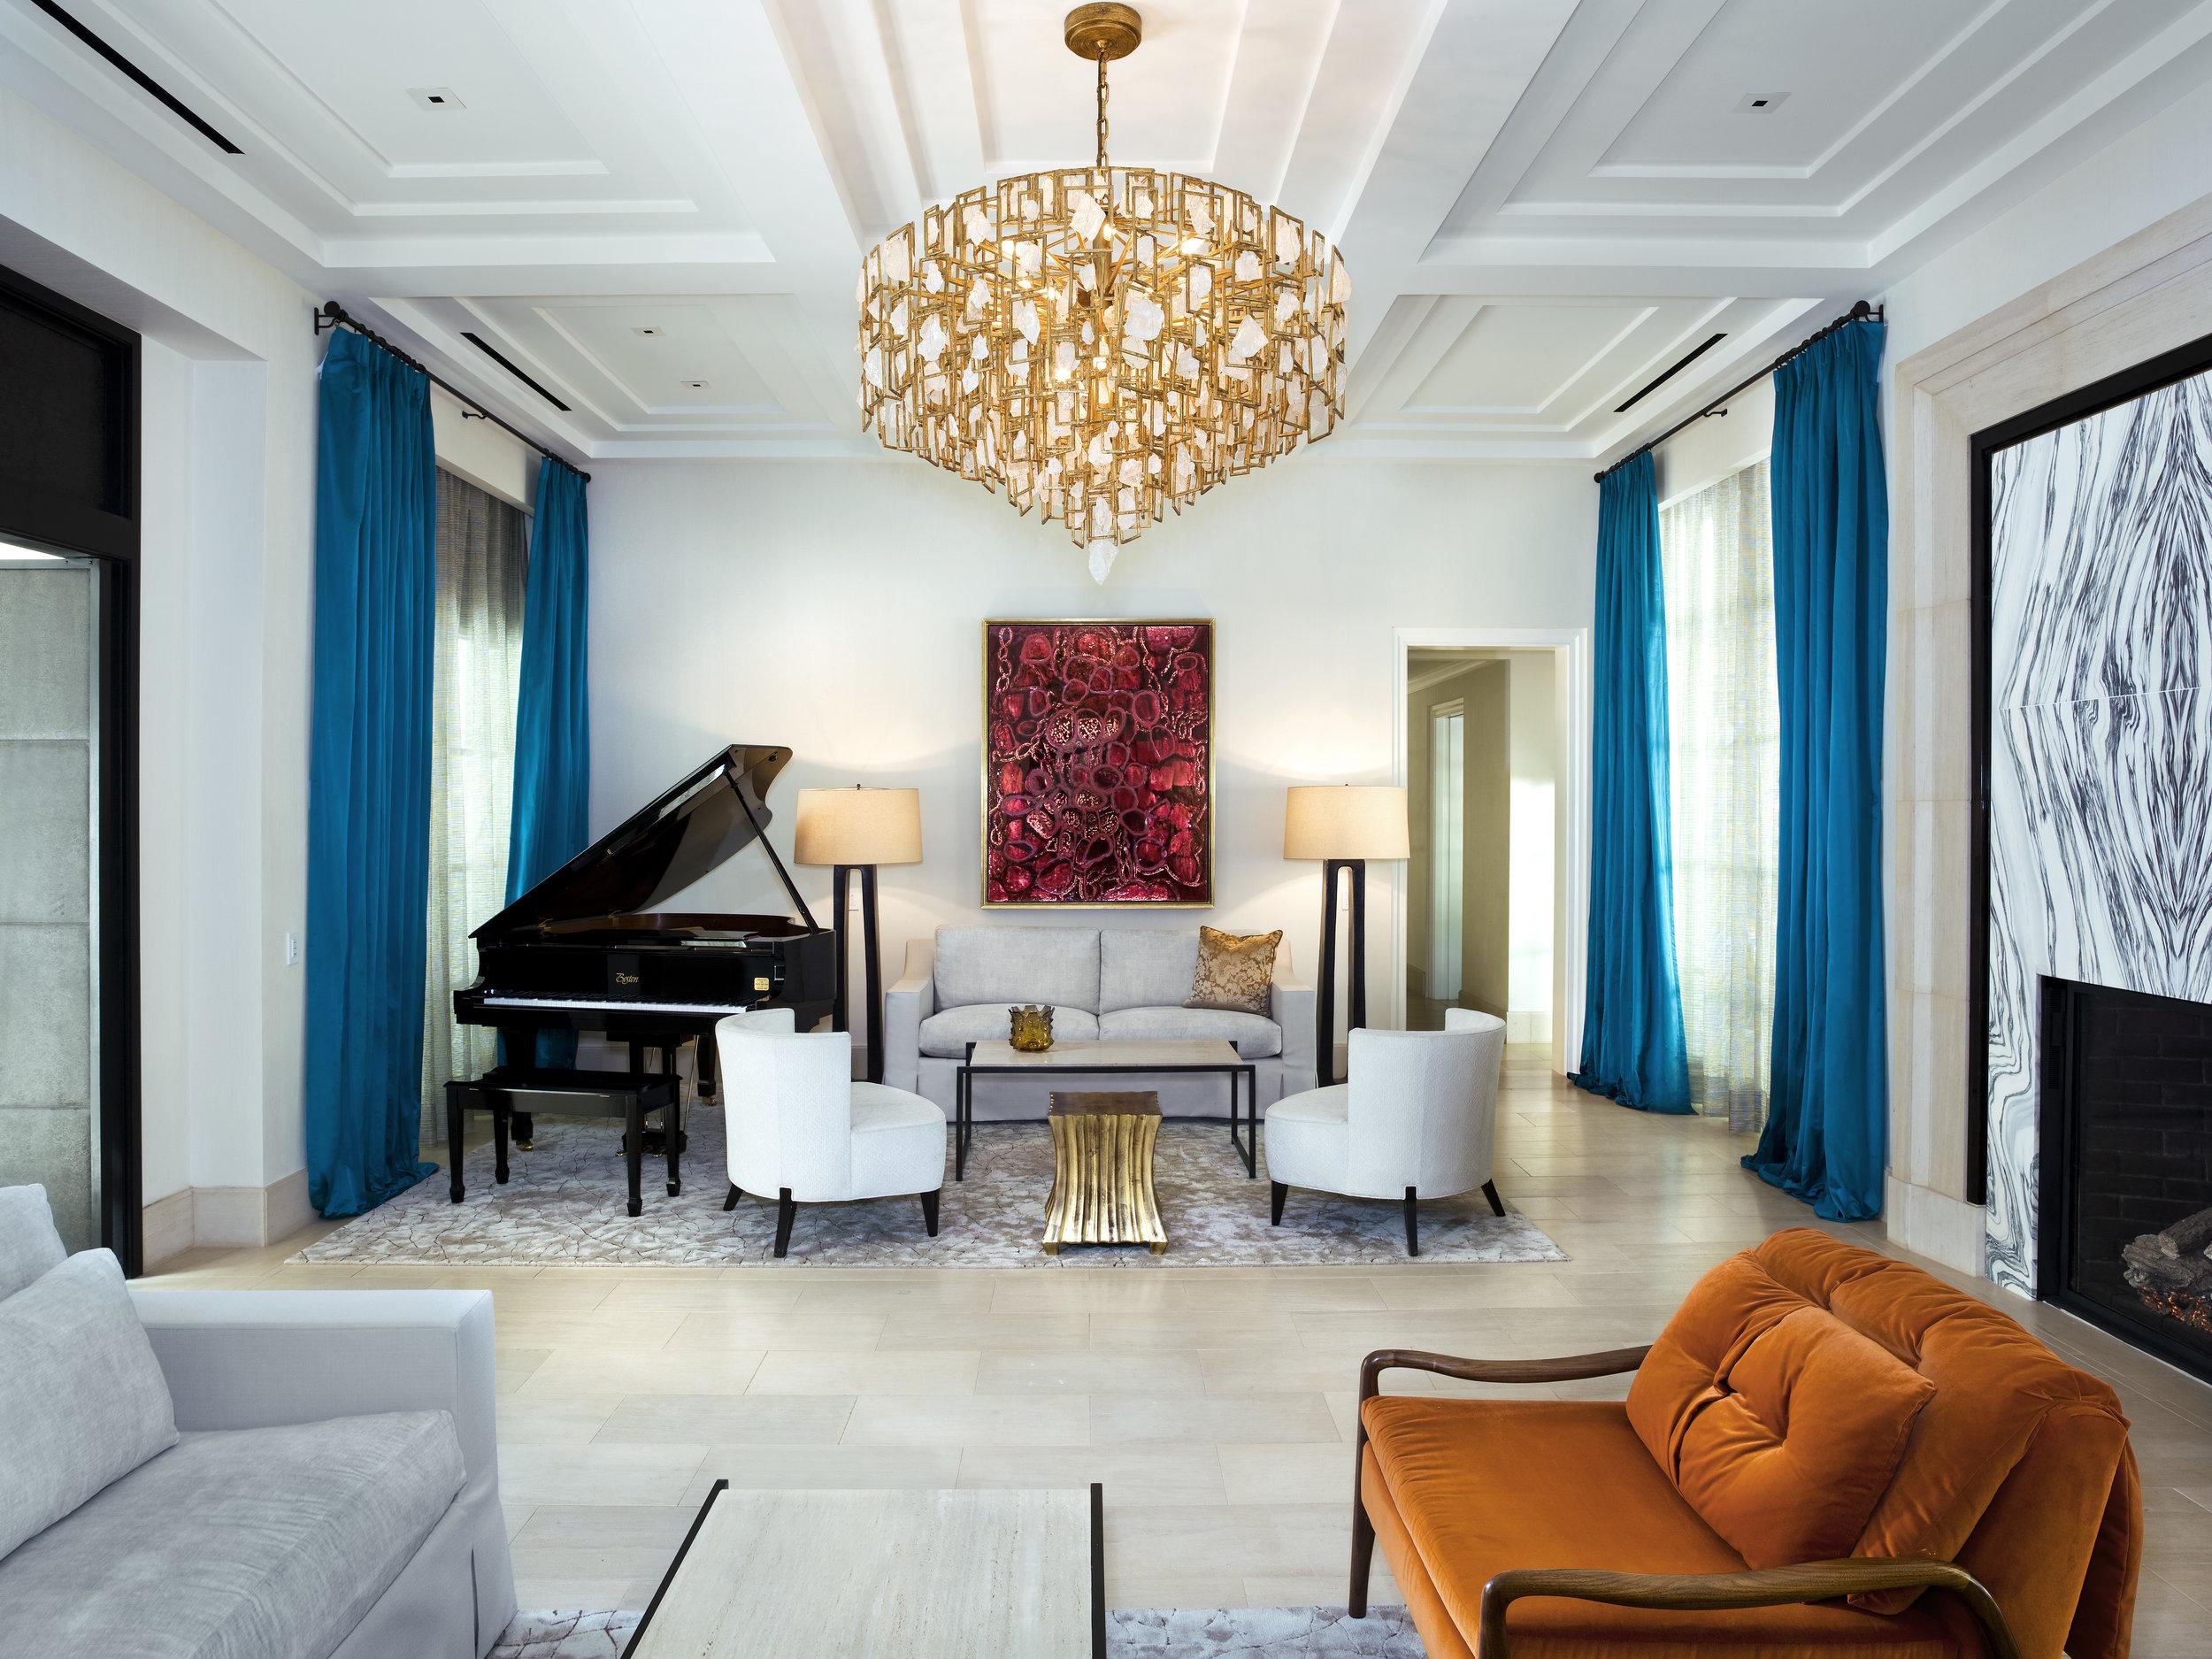 Presidential Suite at Hotel Bel-Air located in Los Angeles